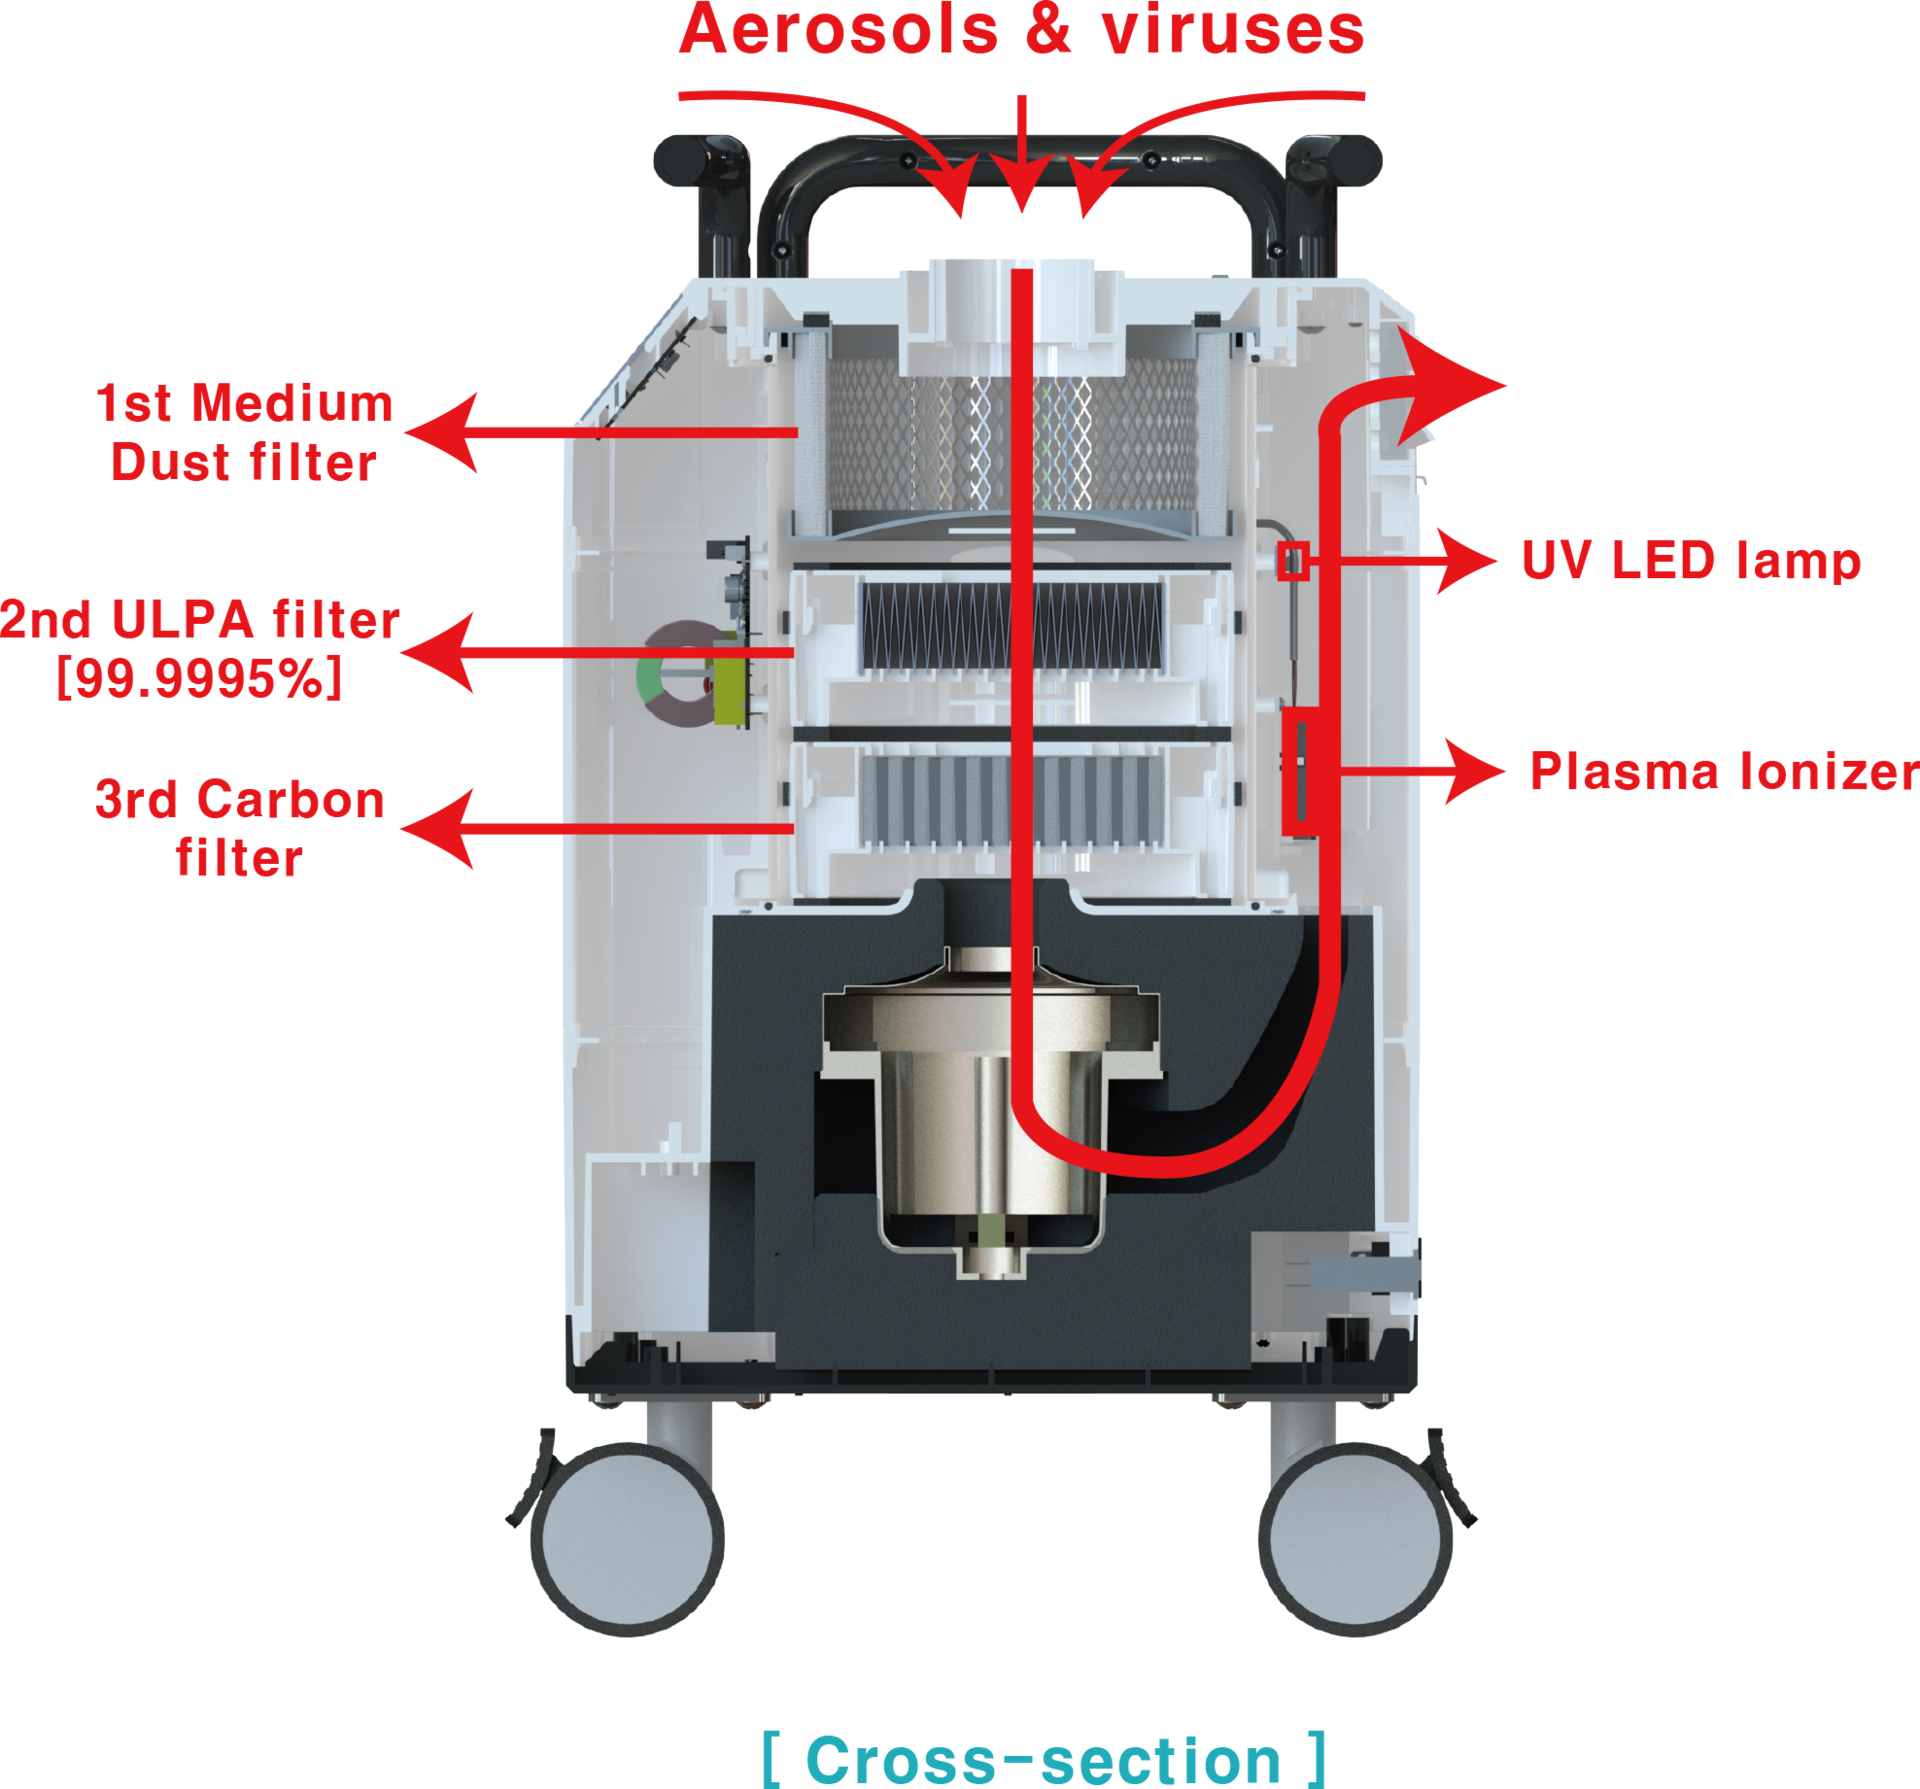 Aerosol suction_dental dust collector_dermatology laser inhaler_dust collector_UVC LED sterilization_plasma sterilizer